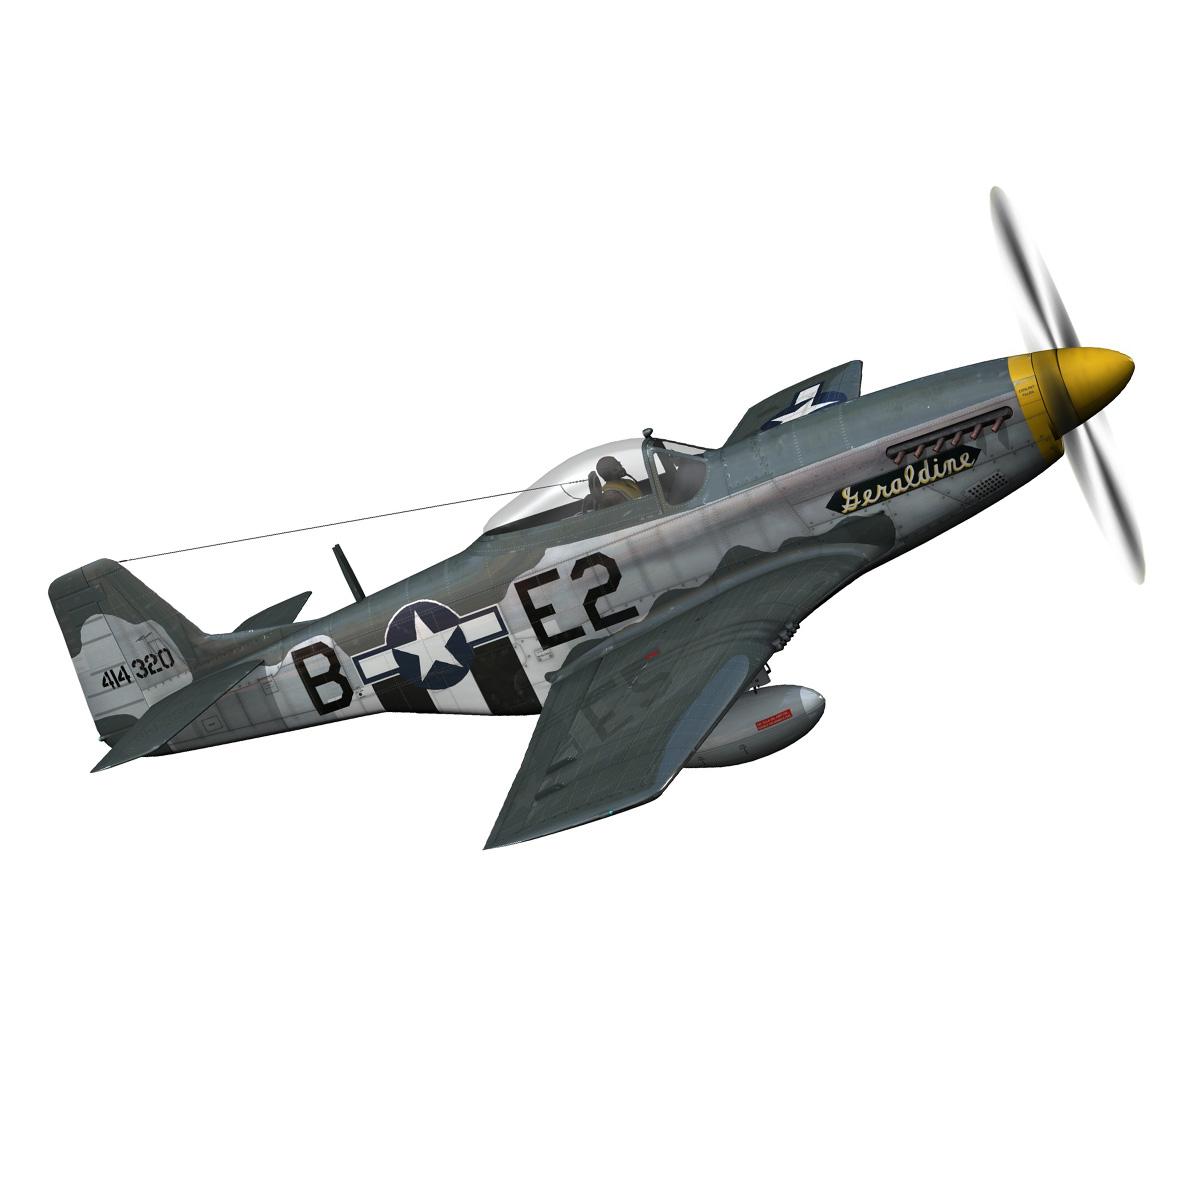 North American P-51D - Geraldine 3d model fbx c4d lwo obj 265943